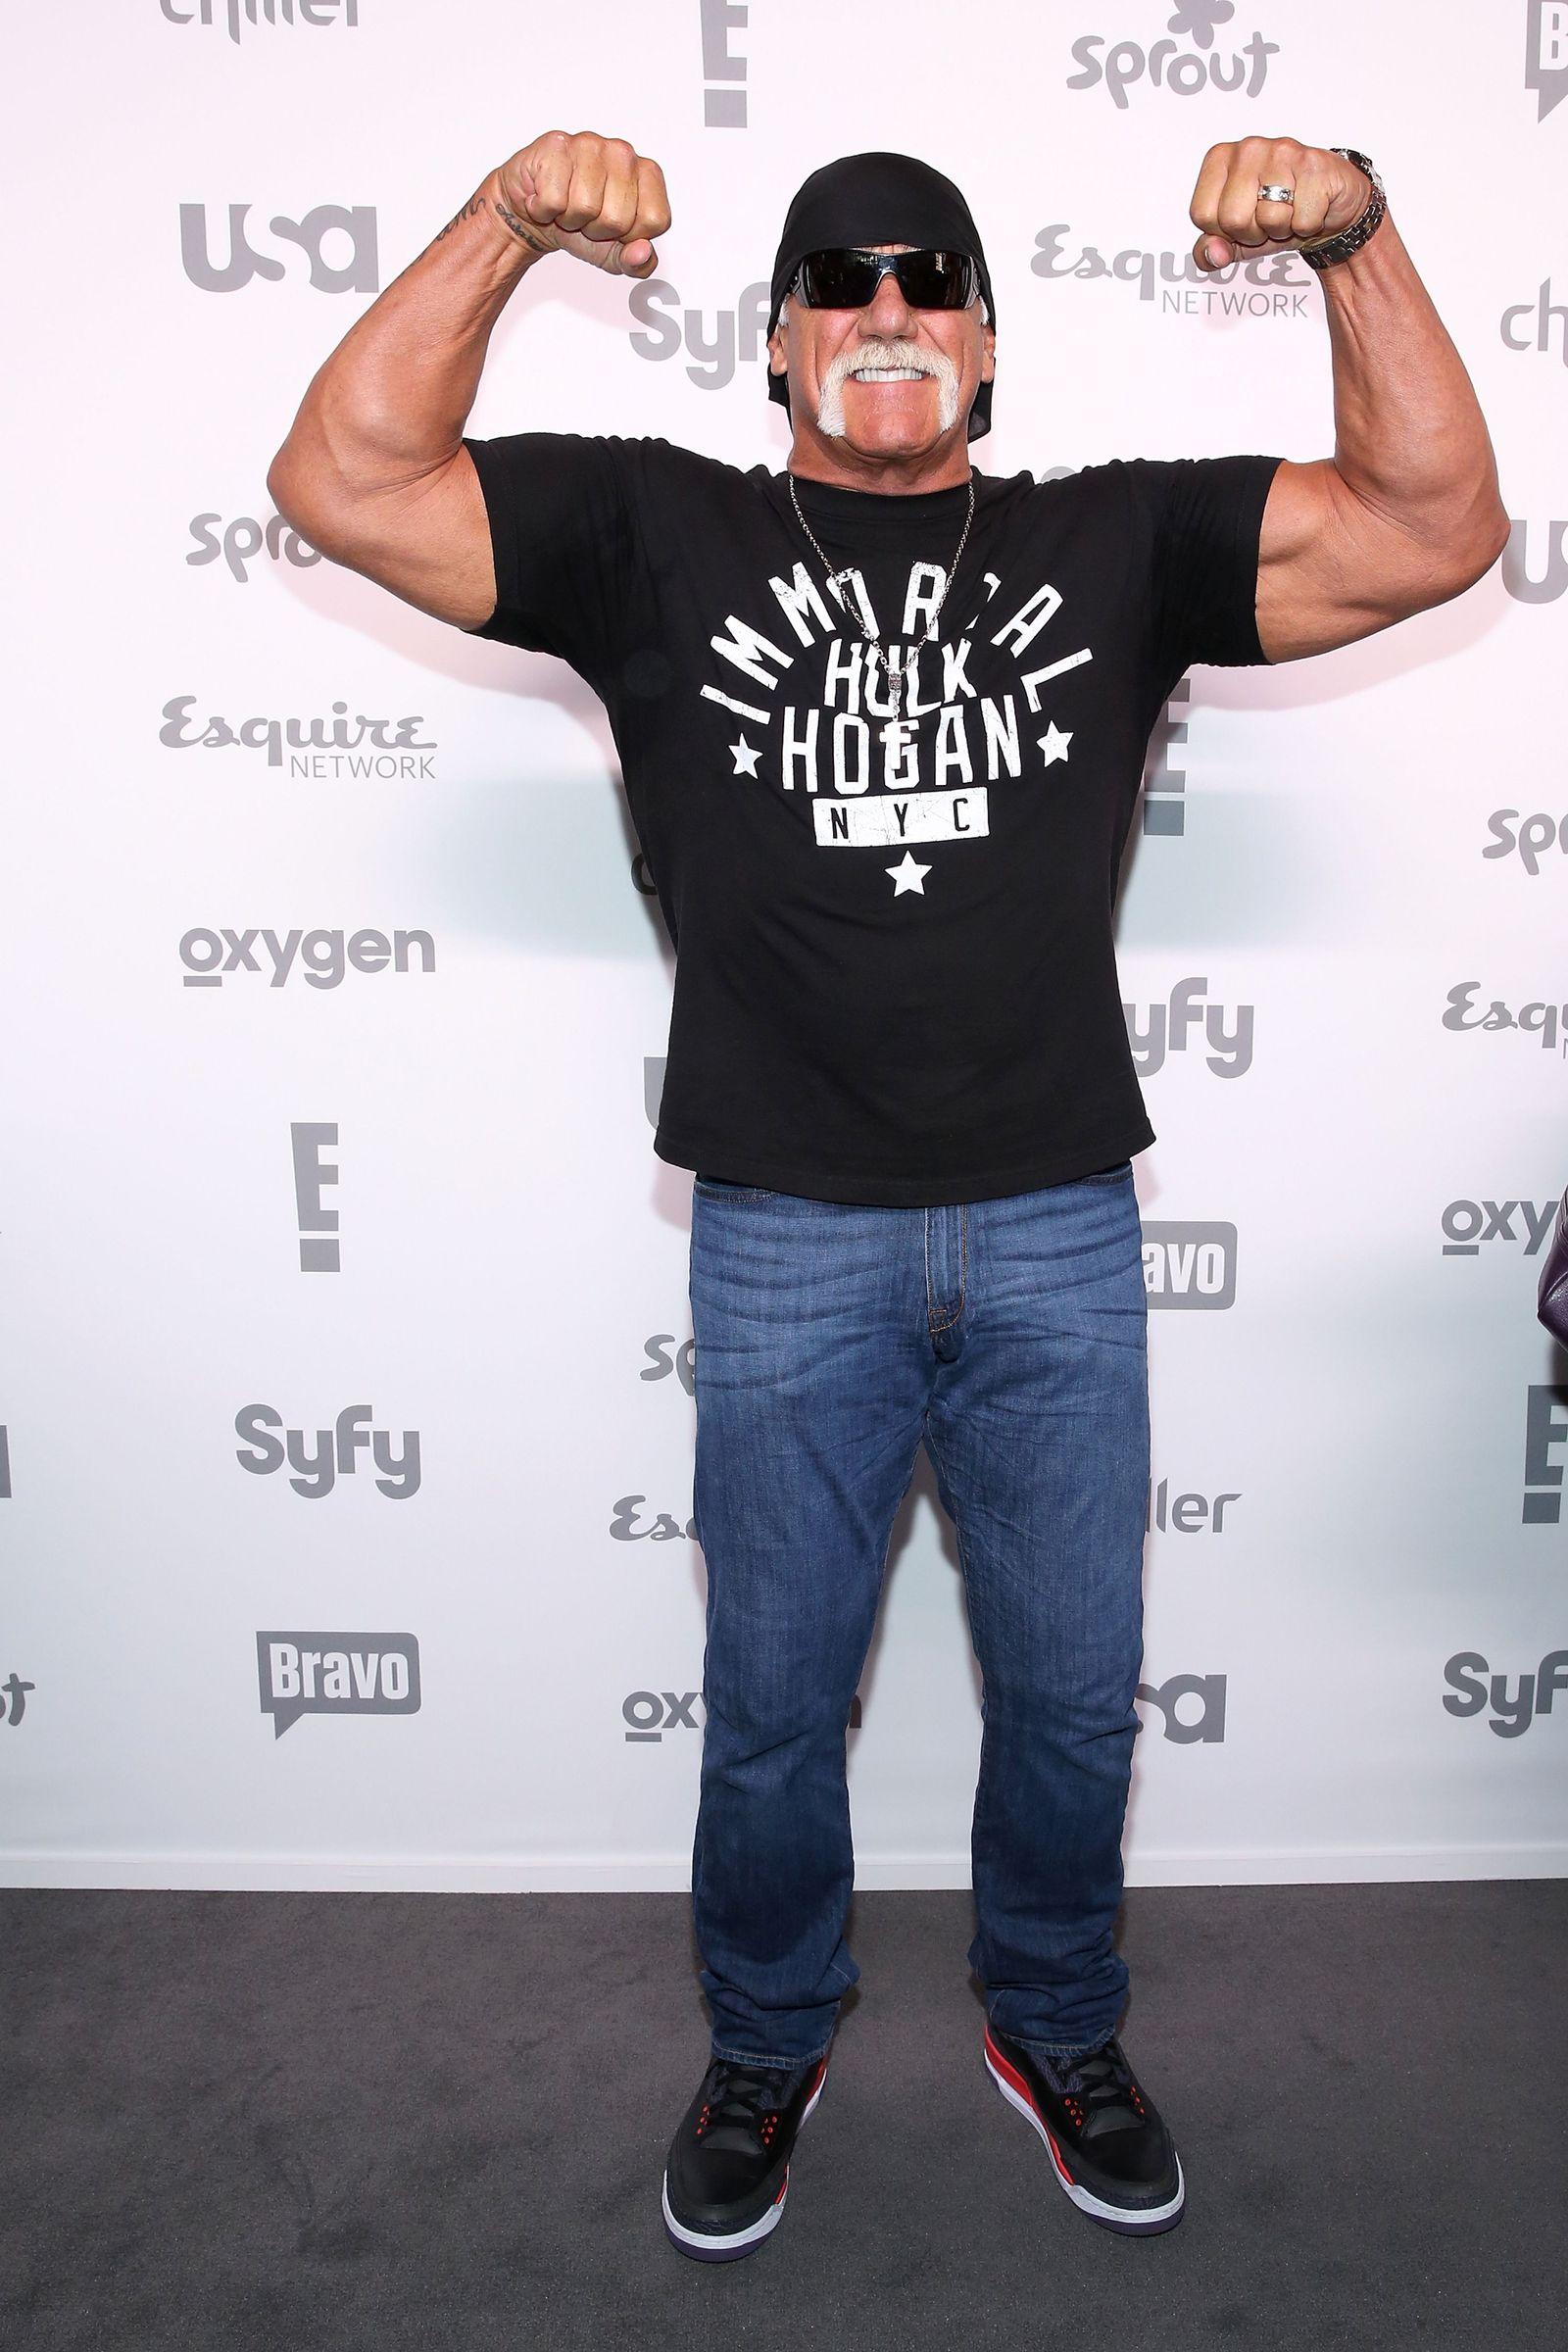 Hluk Hogan